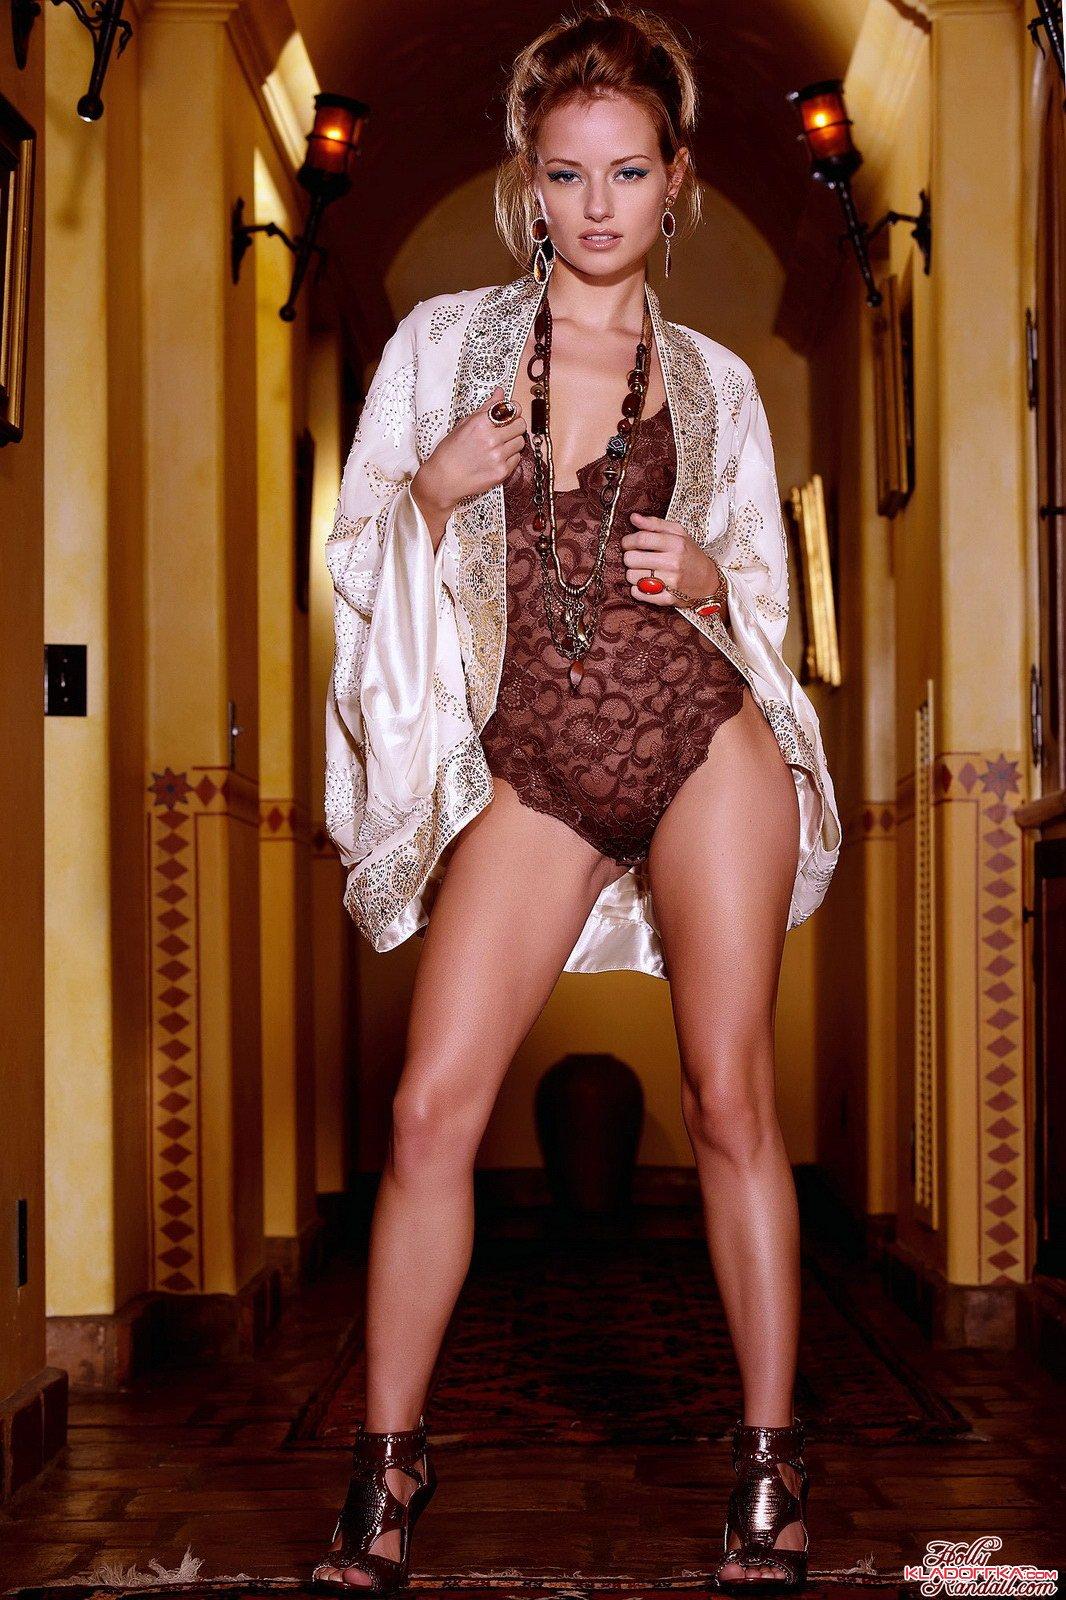 Gabi фото клубничка и порно